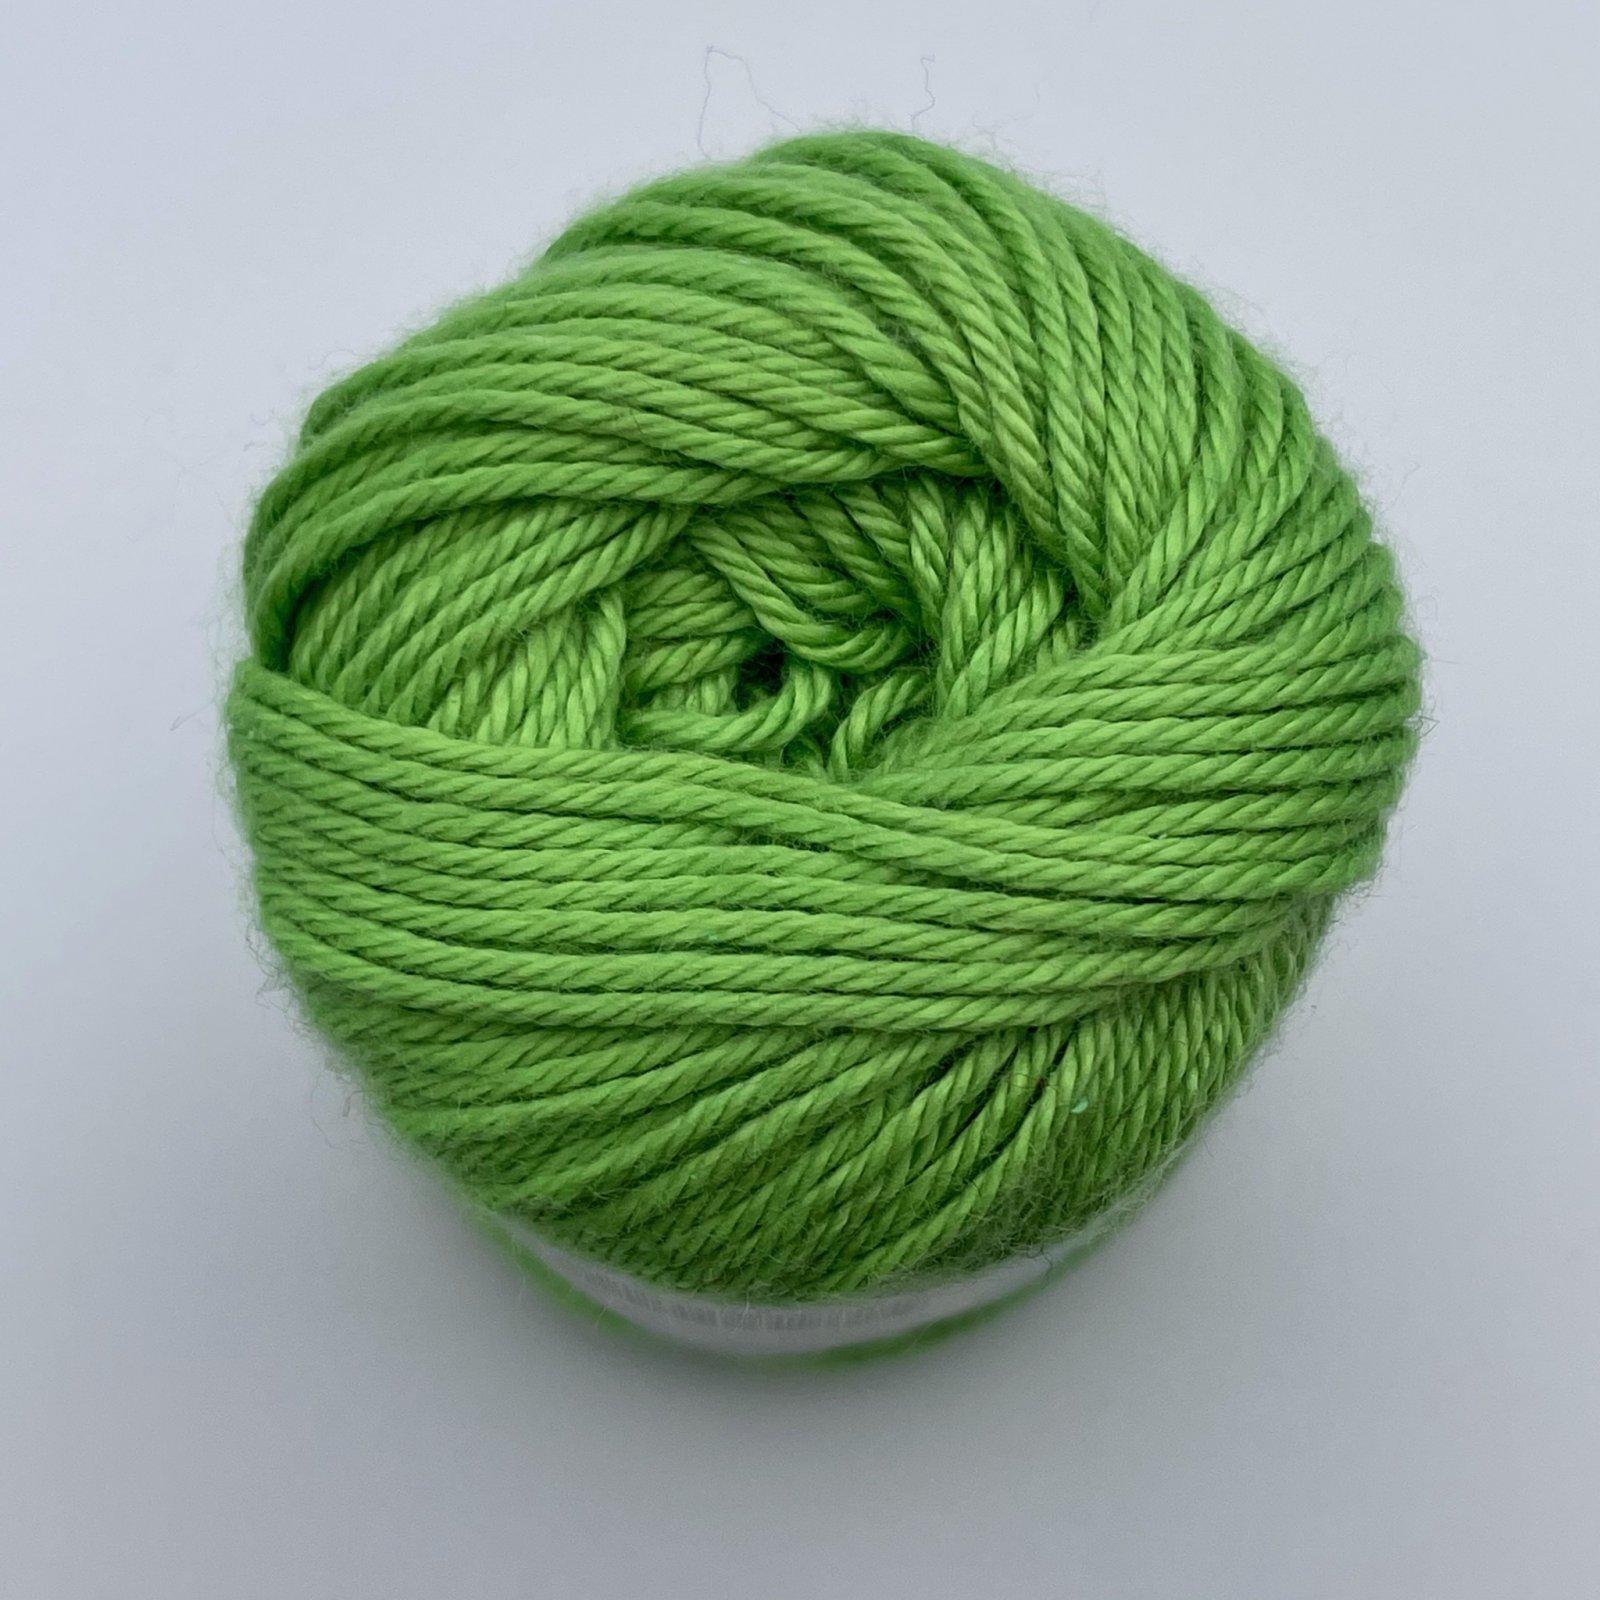 Schachenmayr - Baby Smiles Cotton - 1072 Apple Green